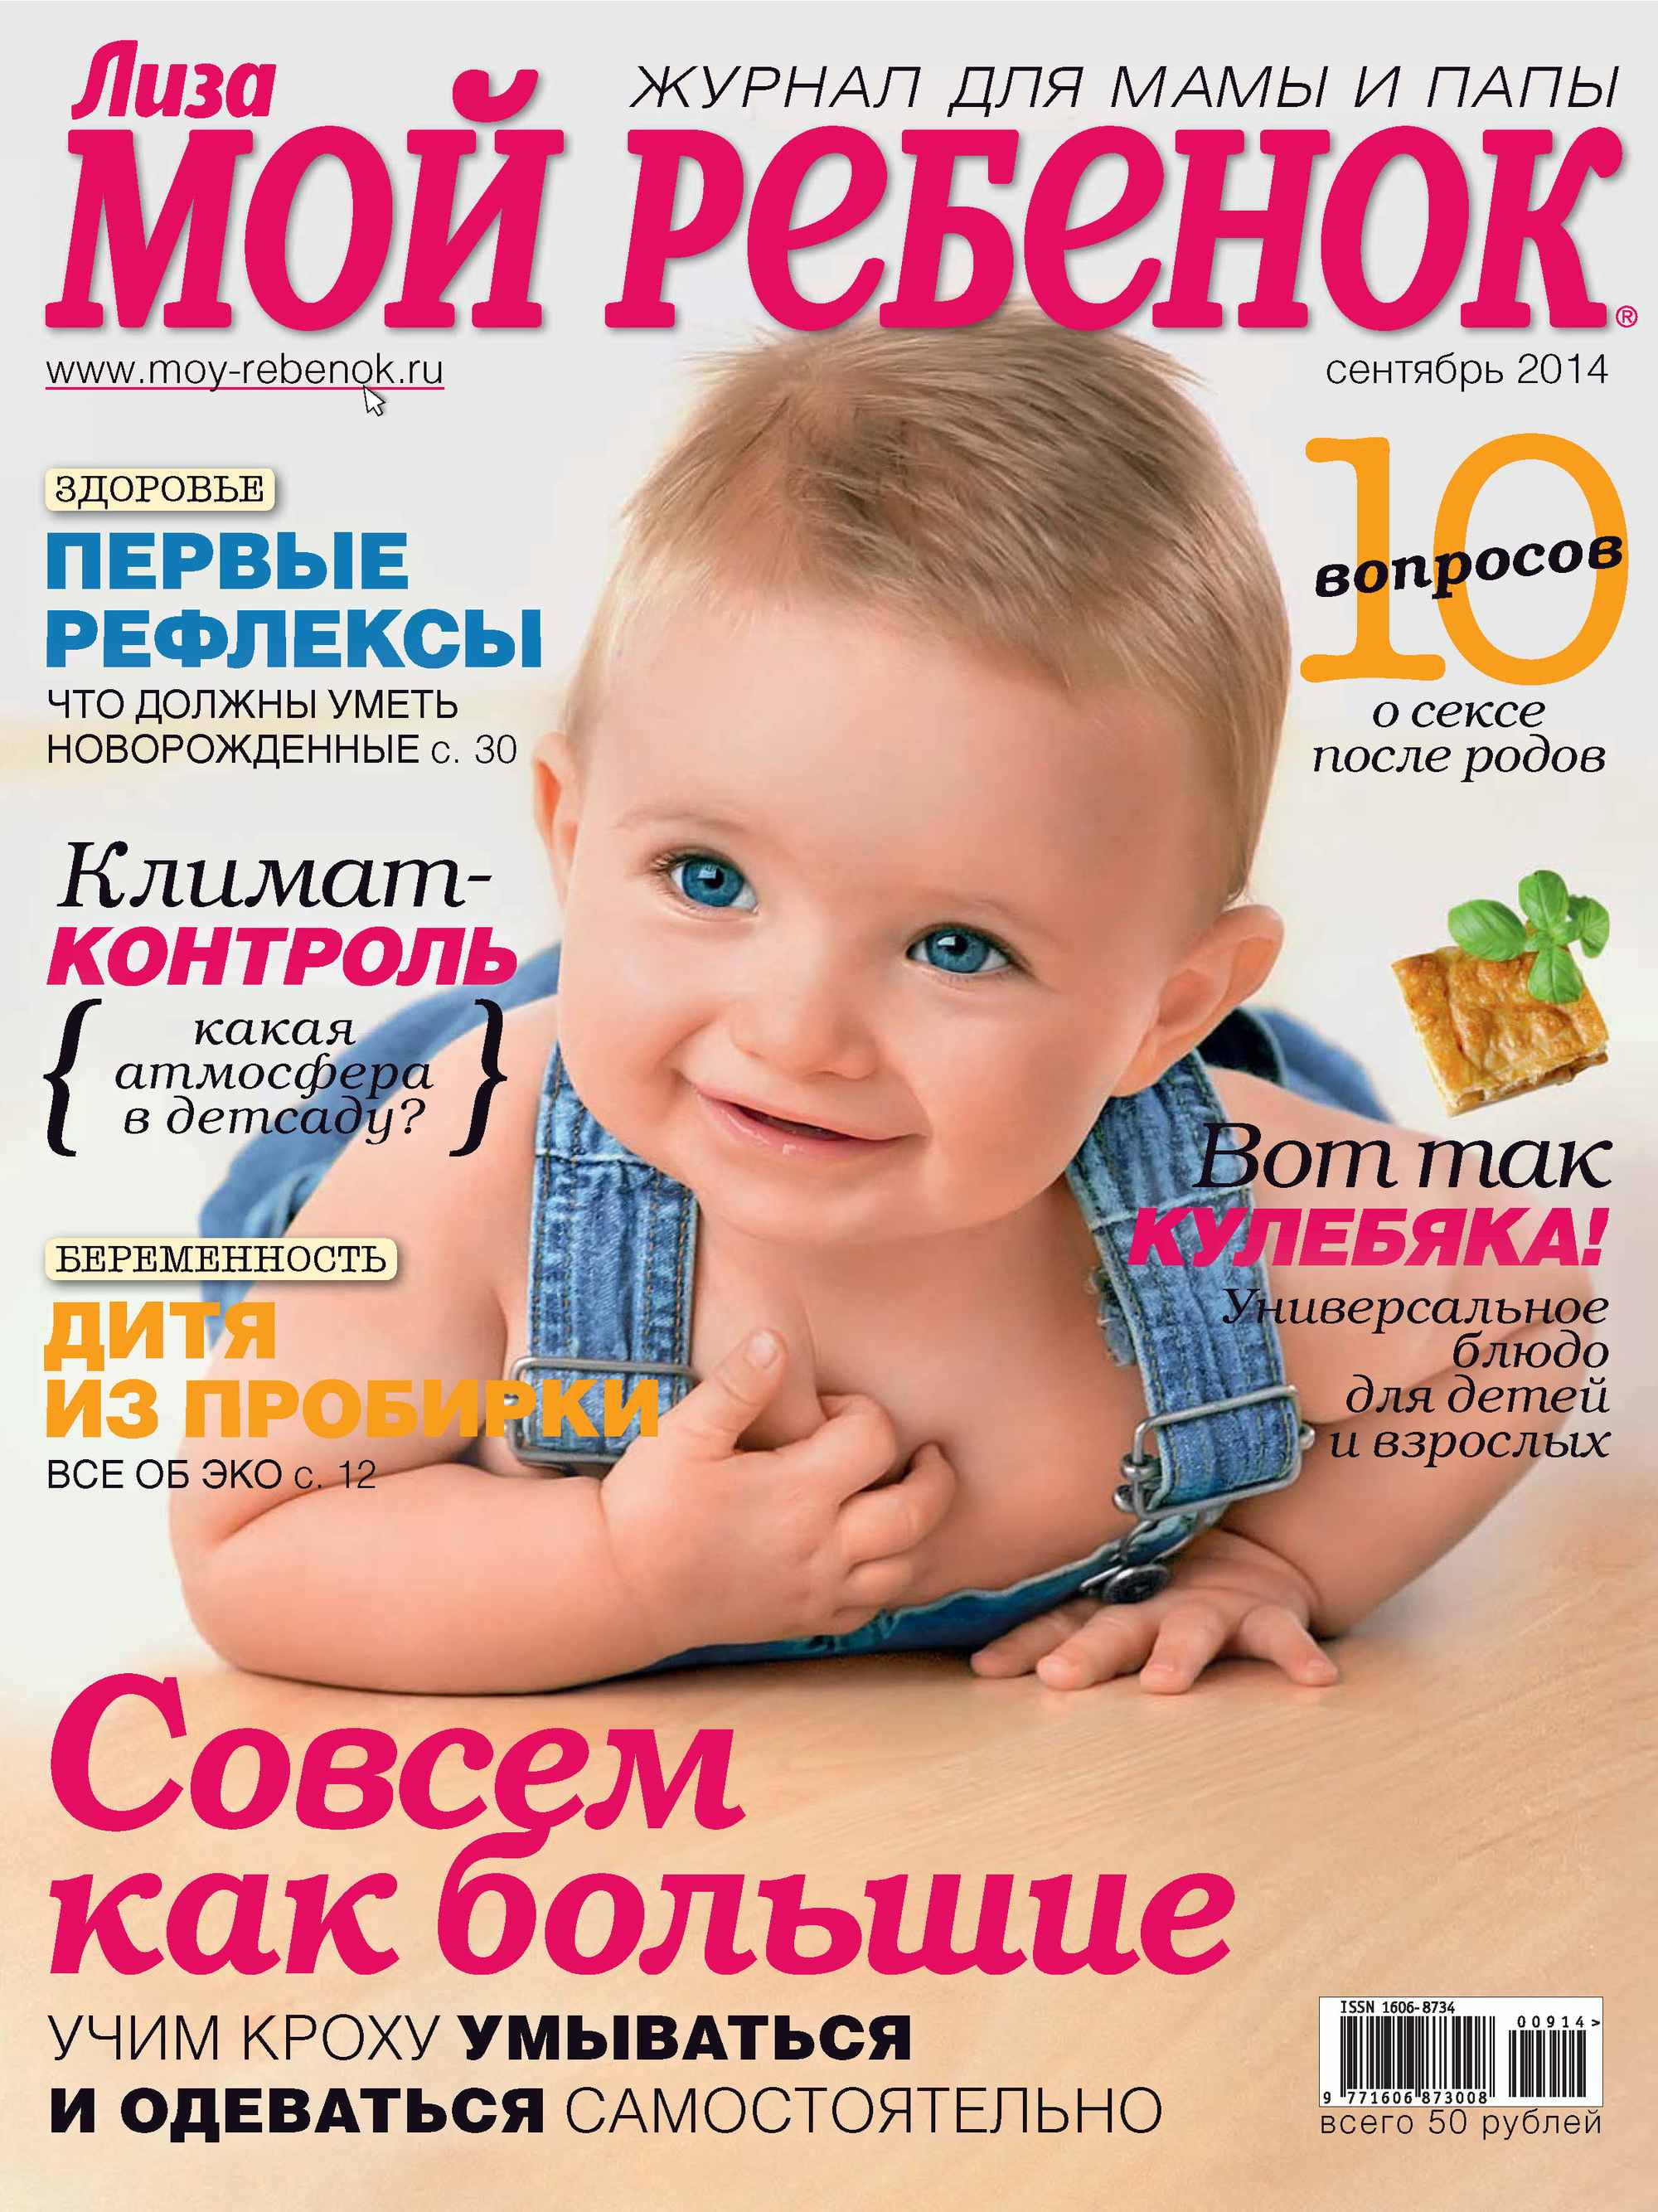 ИД «Бурда» Журнал «Лиза. Мой ребенок» №09/2014 ид бурда журнал лиза мой ребенок 03 2014